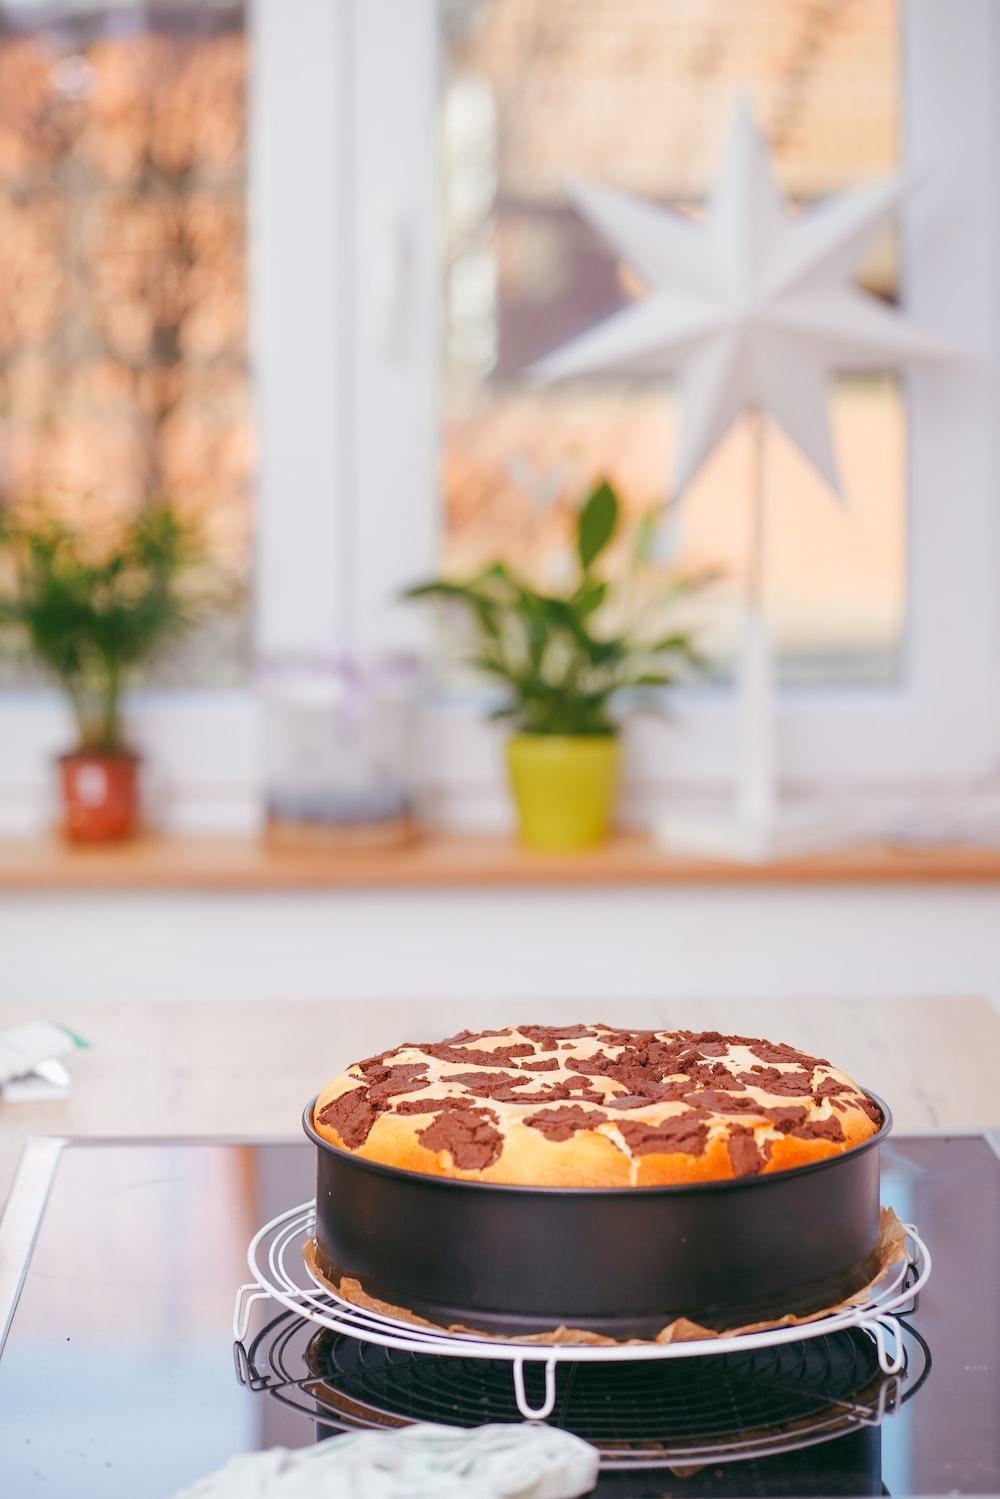 baked pie on pan